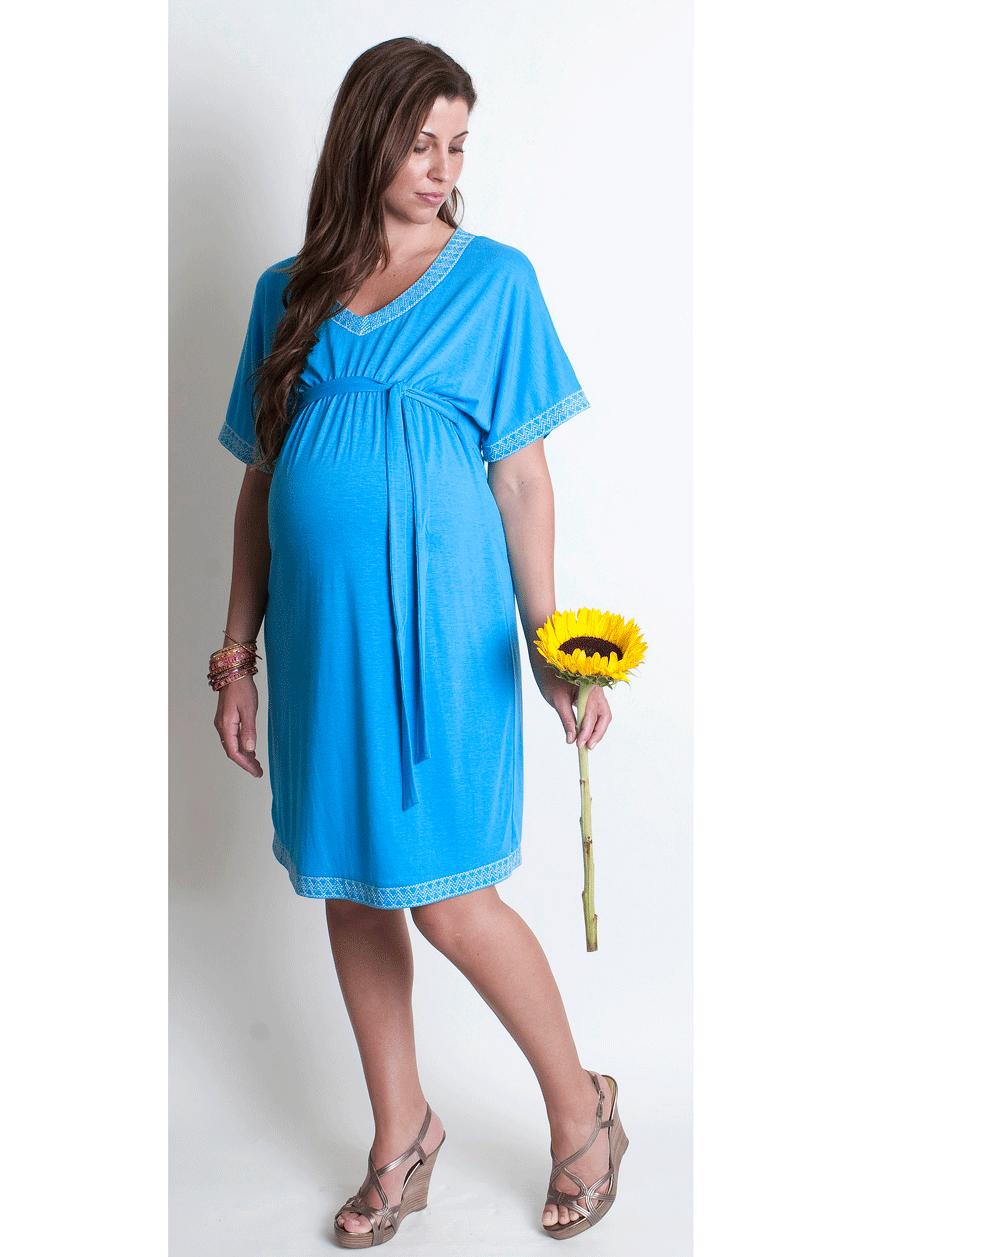 Rent maternity clothes maternity dresses rental mine for nine rent maternity clothes maternity dresses rental mine for nine ombrellifo Image collections